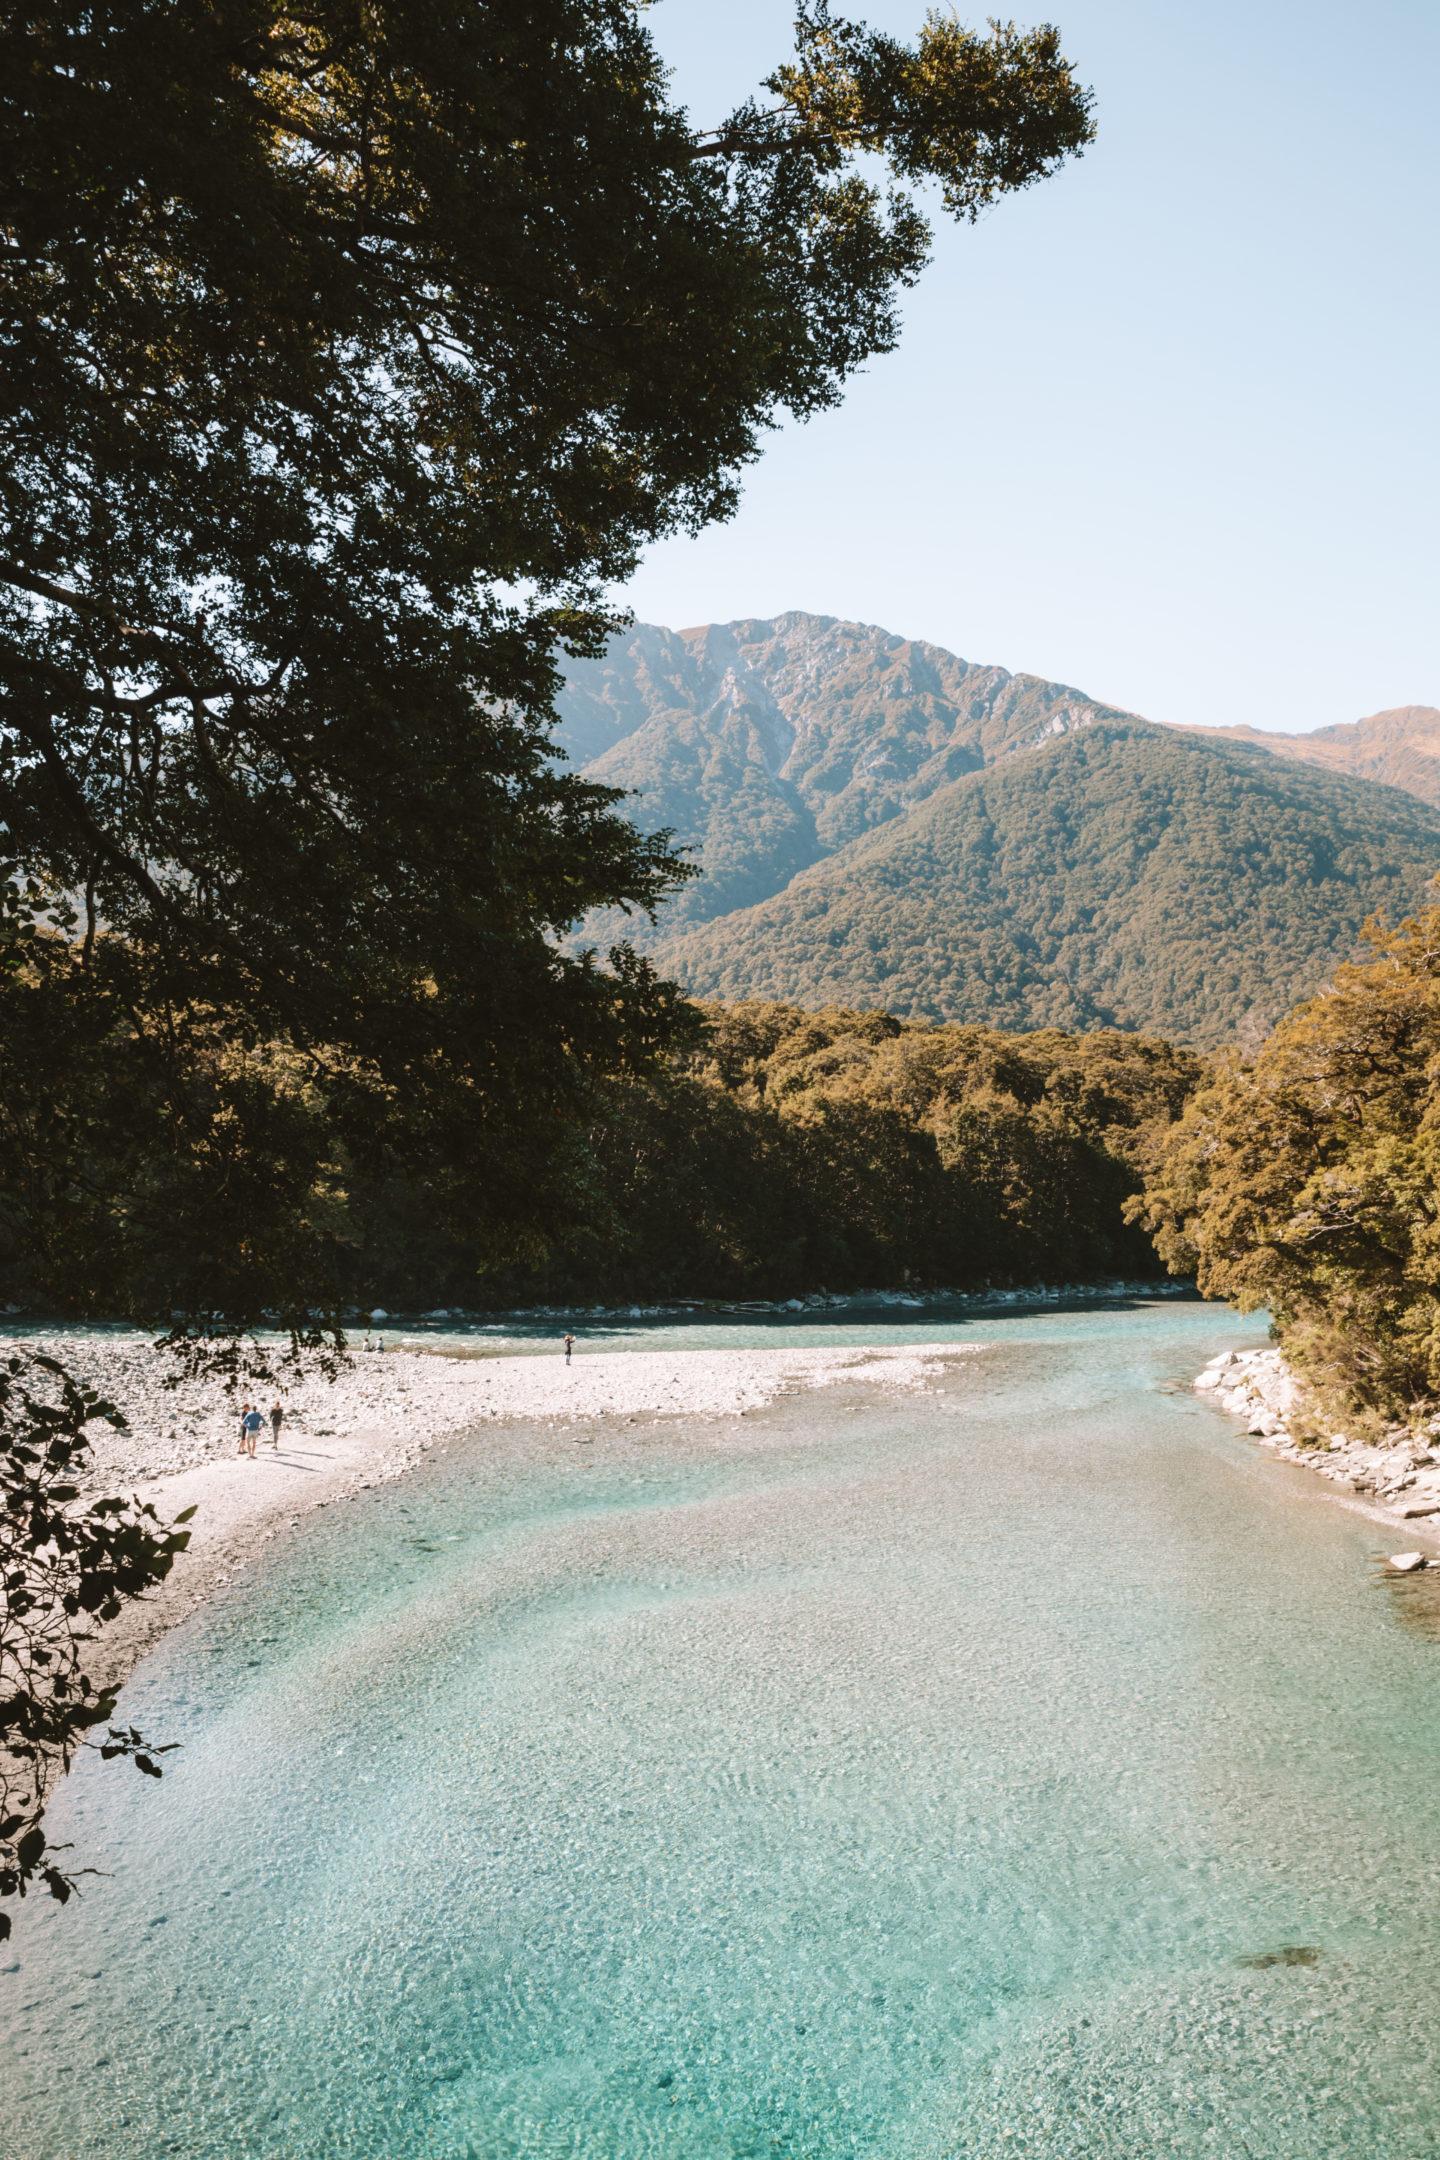 Wanaka Nouvelle-Zélande - Blondie Baby blog voyages et mode